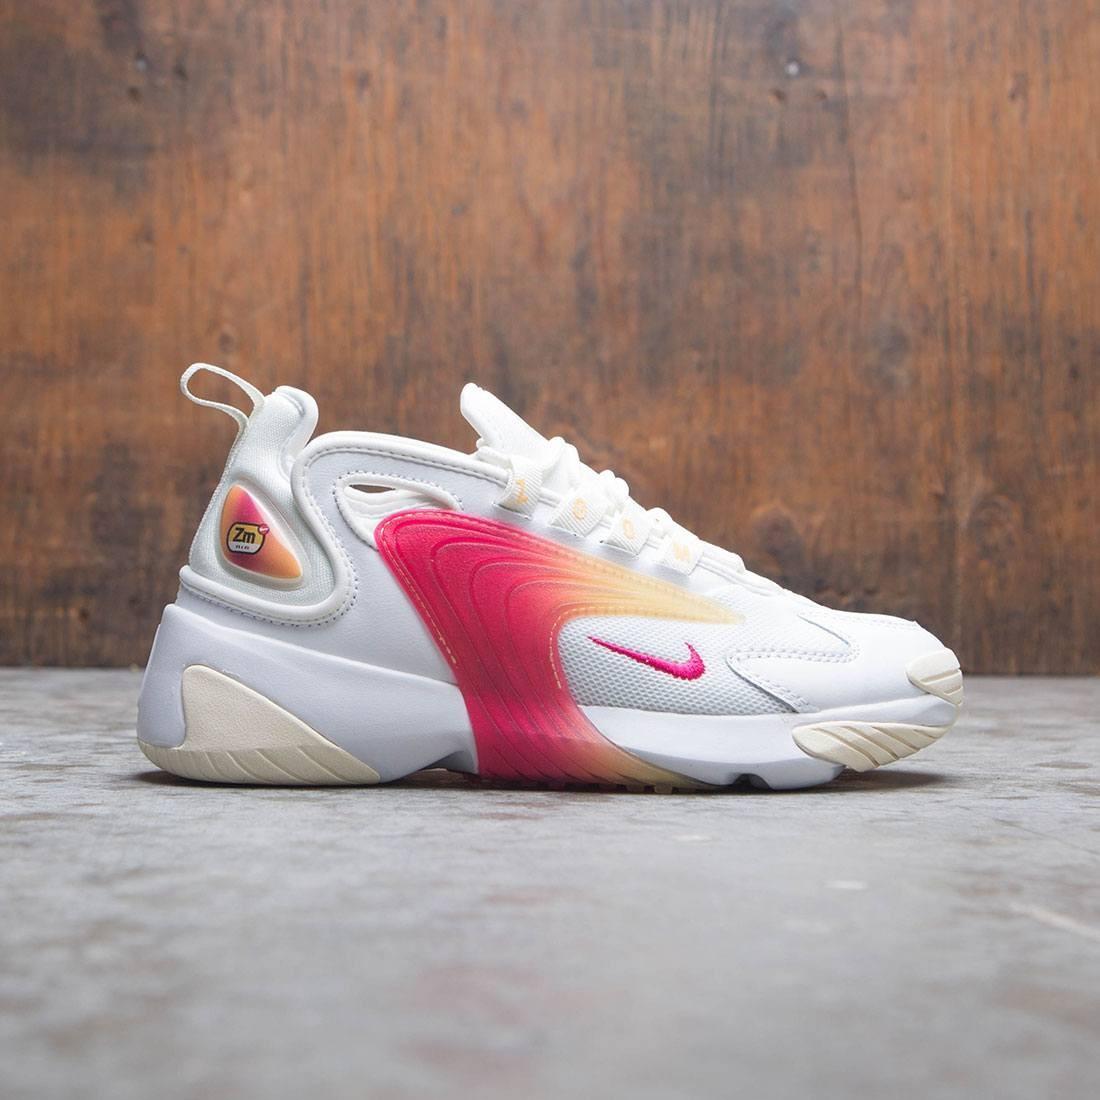 the latest sale retailer new arrivals Nike Women Zoom 2K (white / rush pink-sail-melon tint)